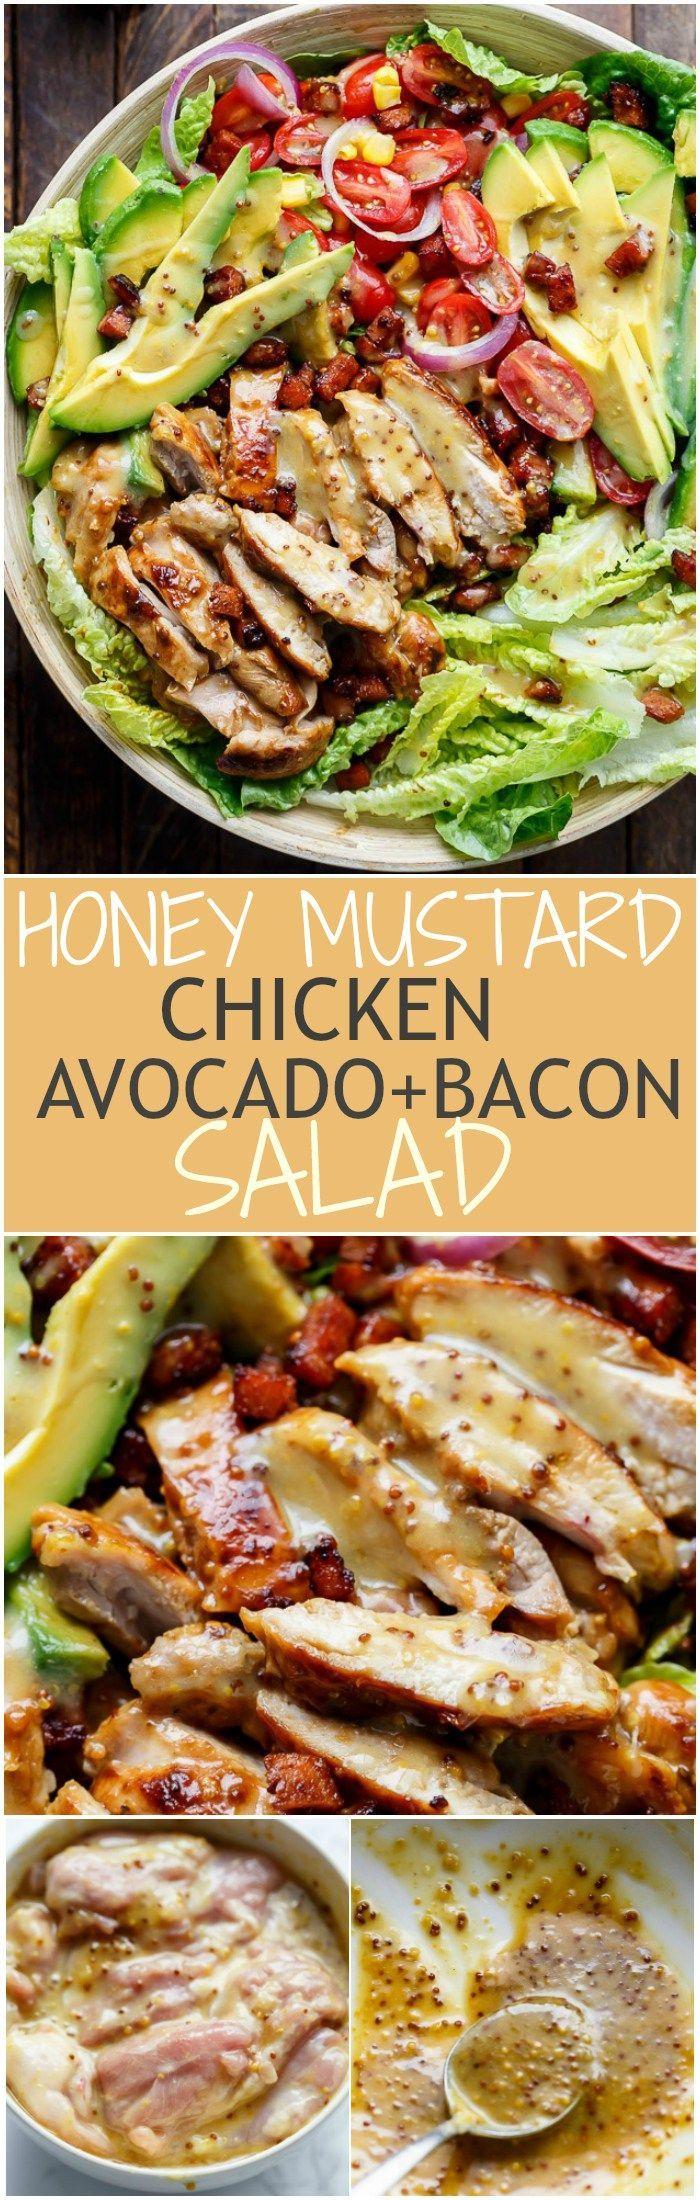 Honey Mustard Chicken, Avocado + Bacon Salad, with a crazy good Honey Mustard dr...